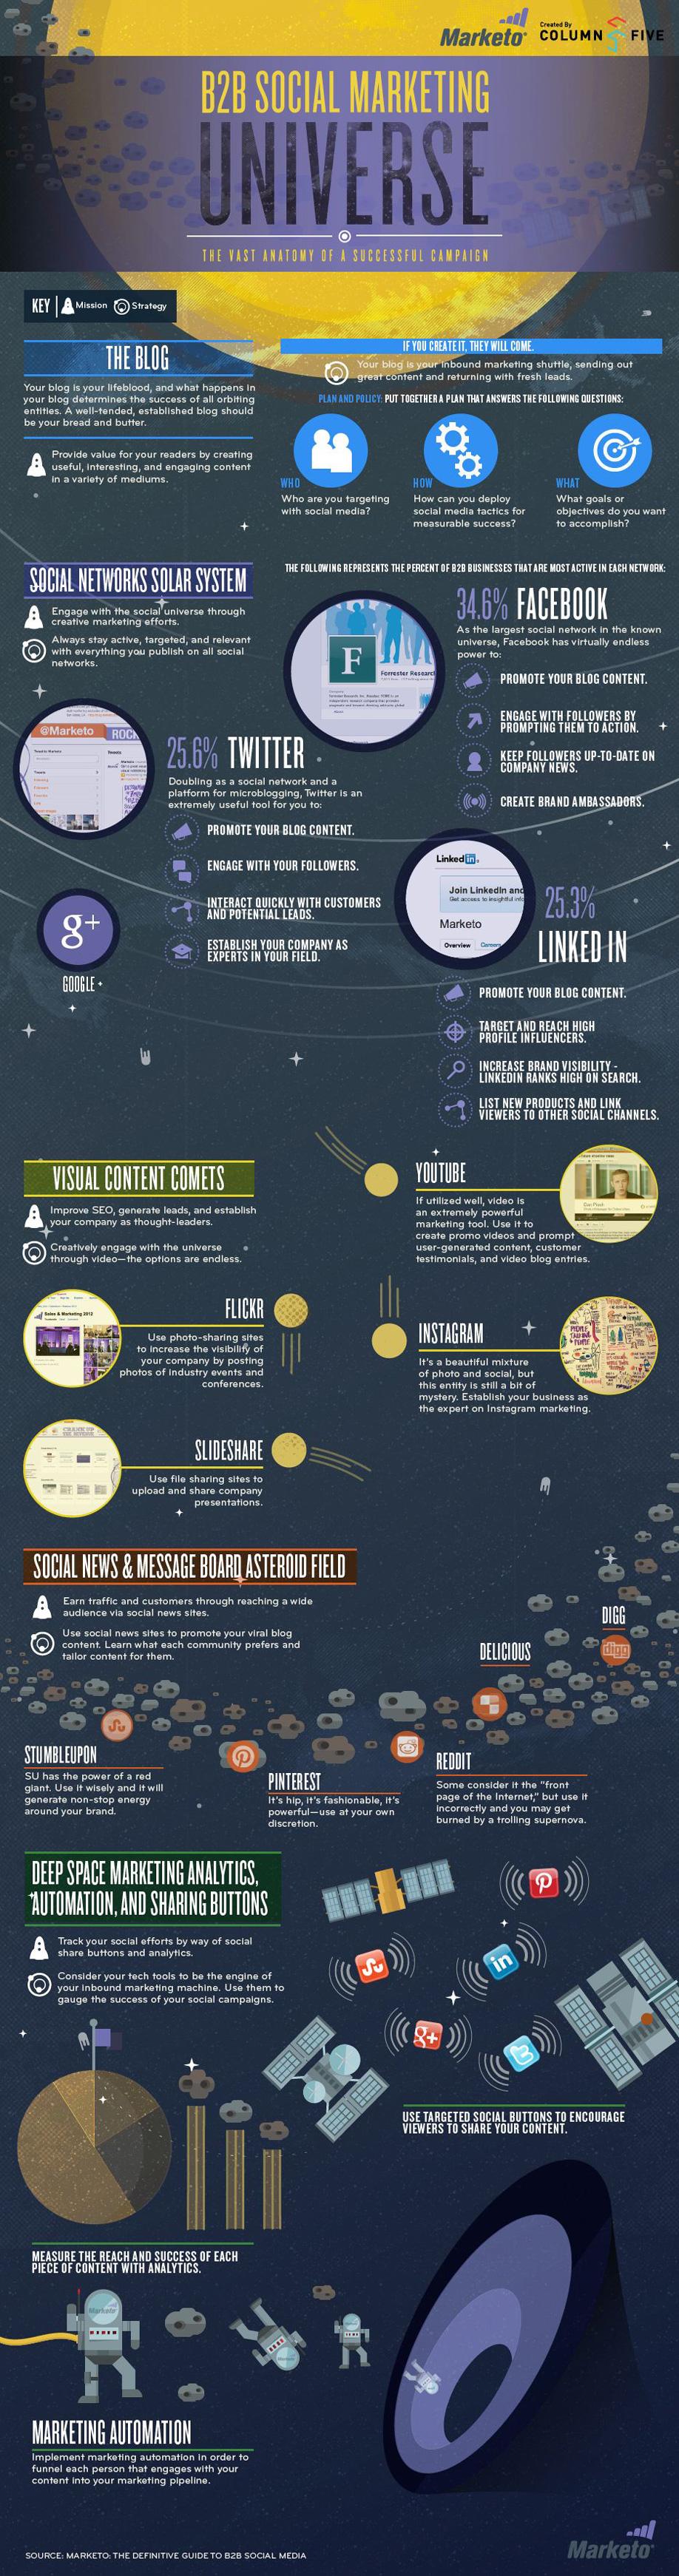 B2b-Social-Marketing-Infographic